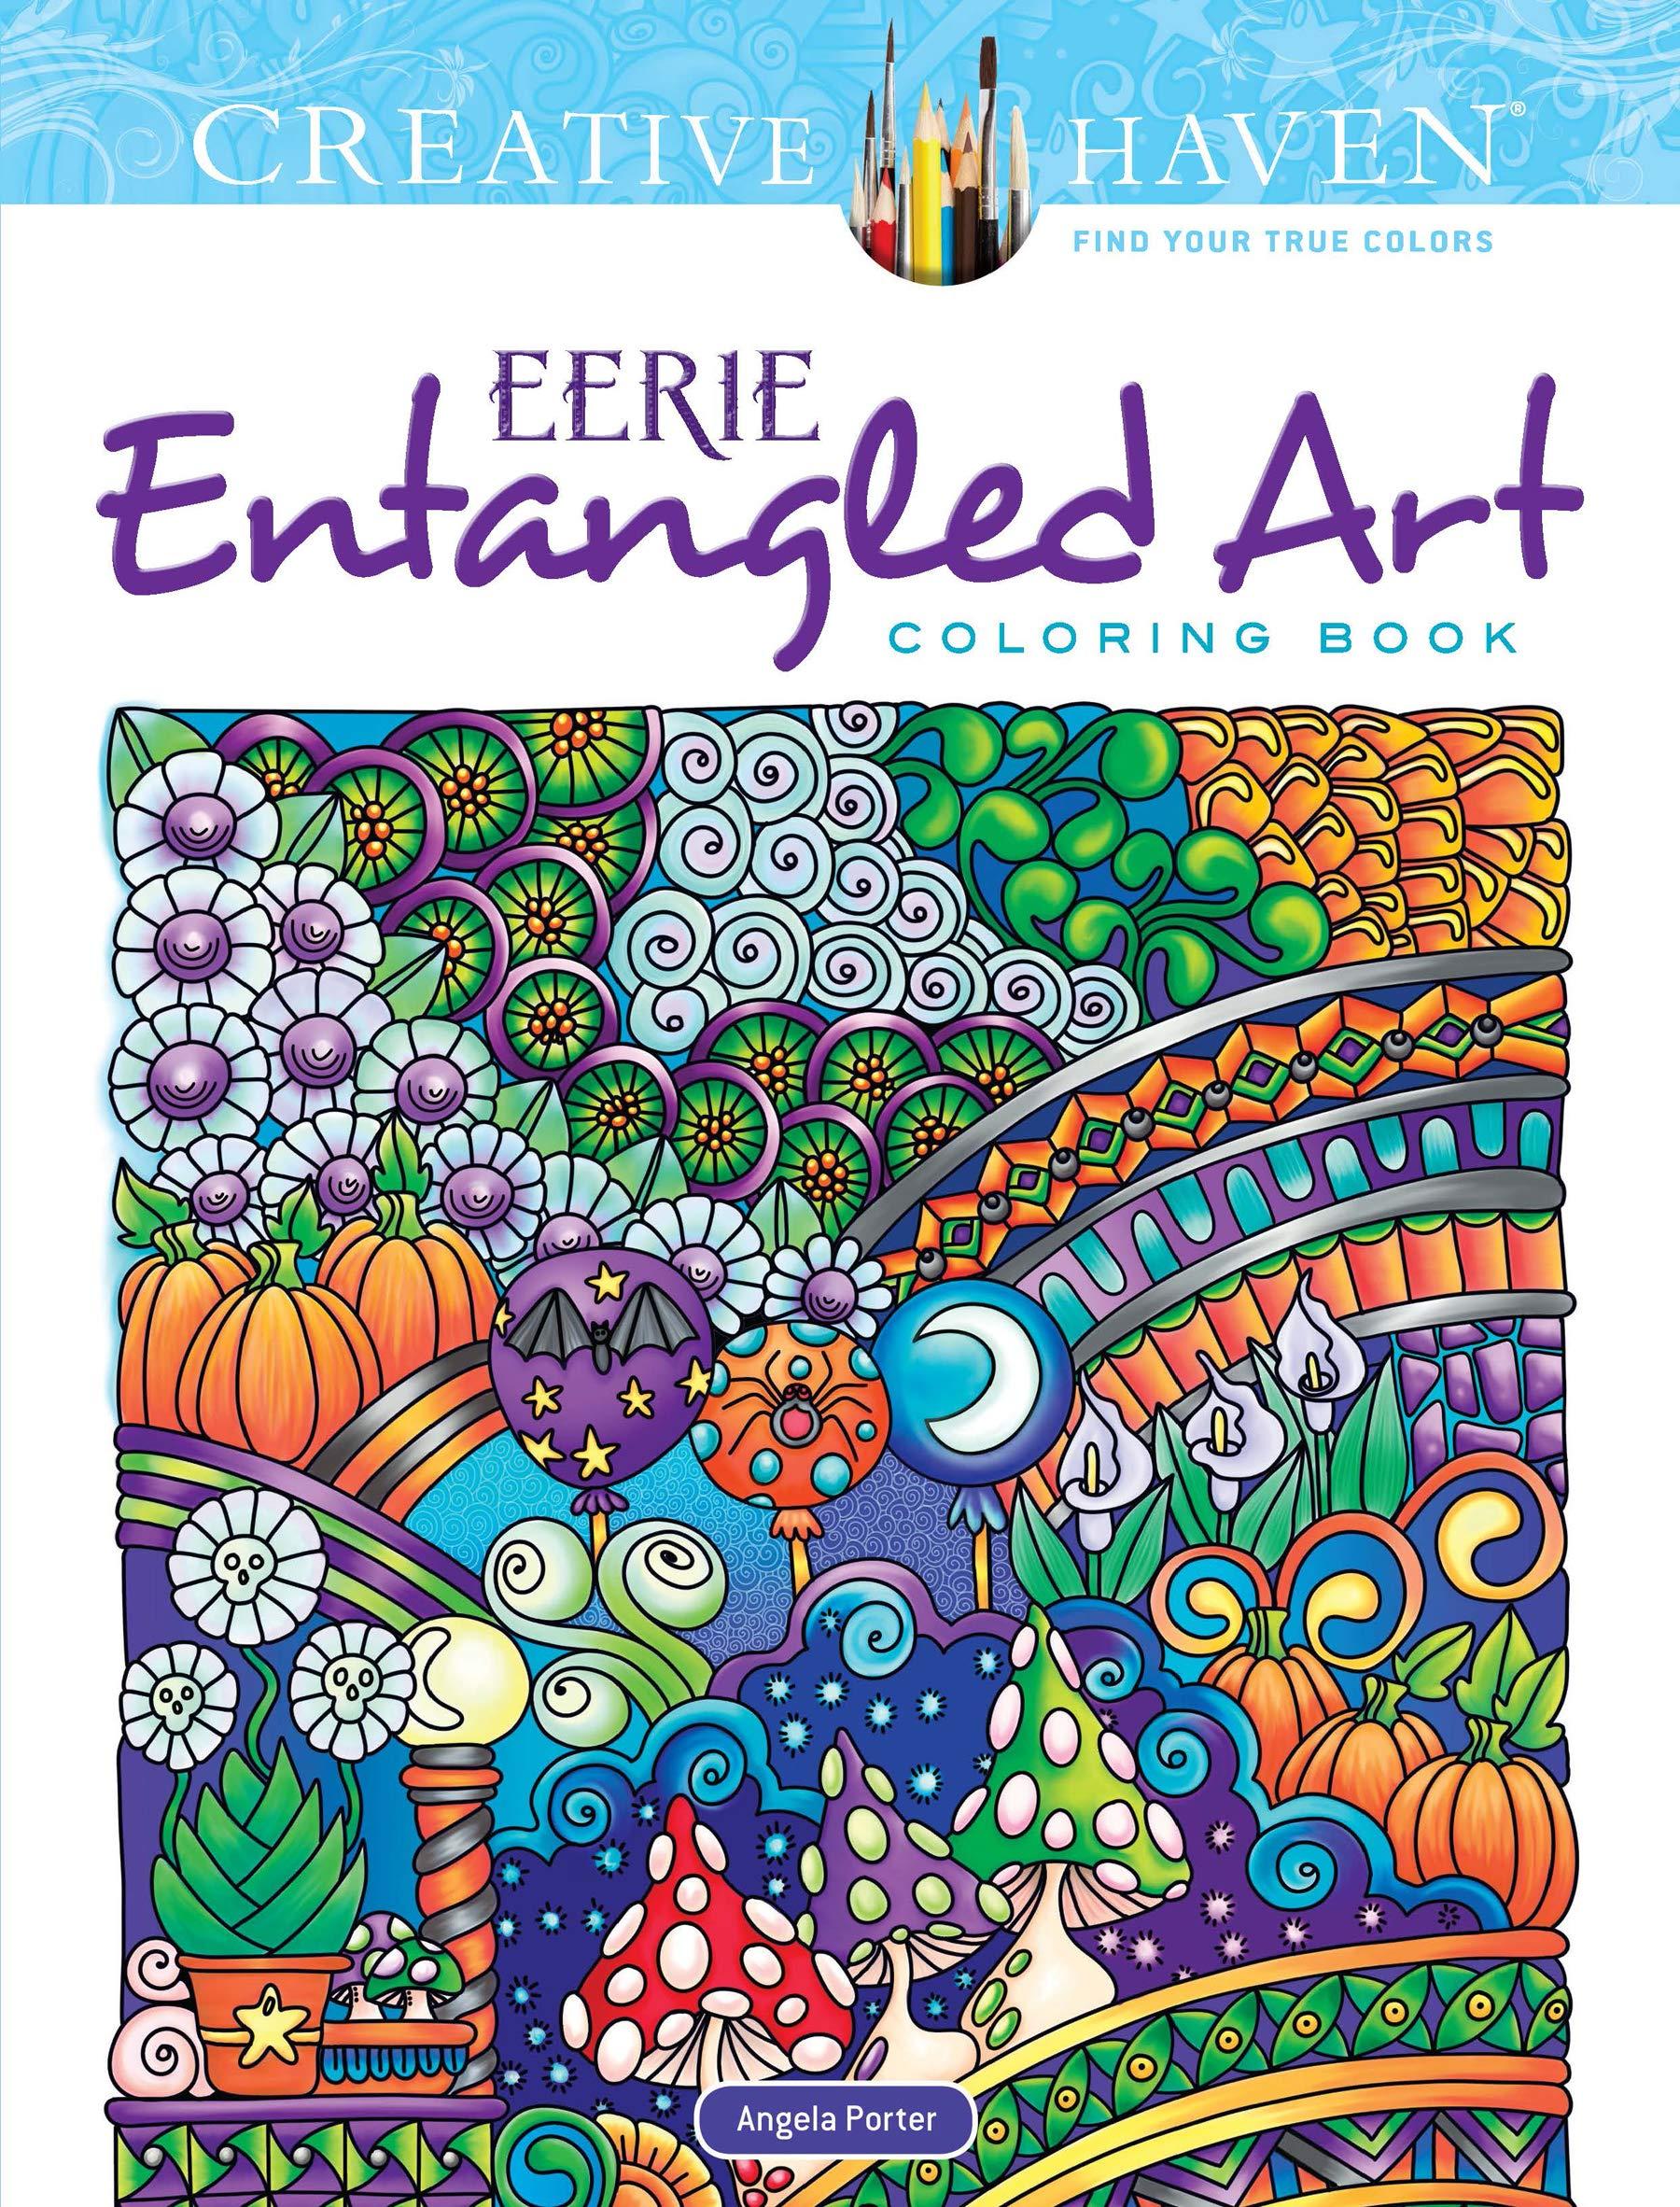 Creative Haven Eerie Entangled Art Coloring Book Adult Amazoncouk Angela Porter 0800759822447 Books